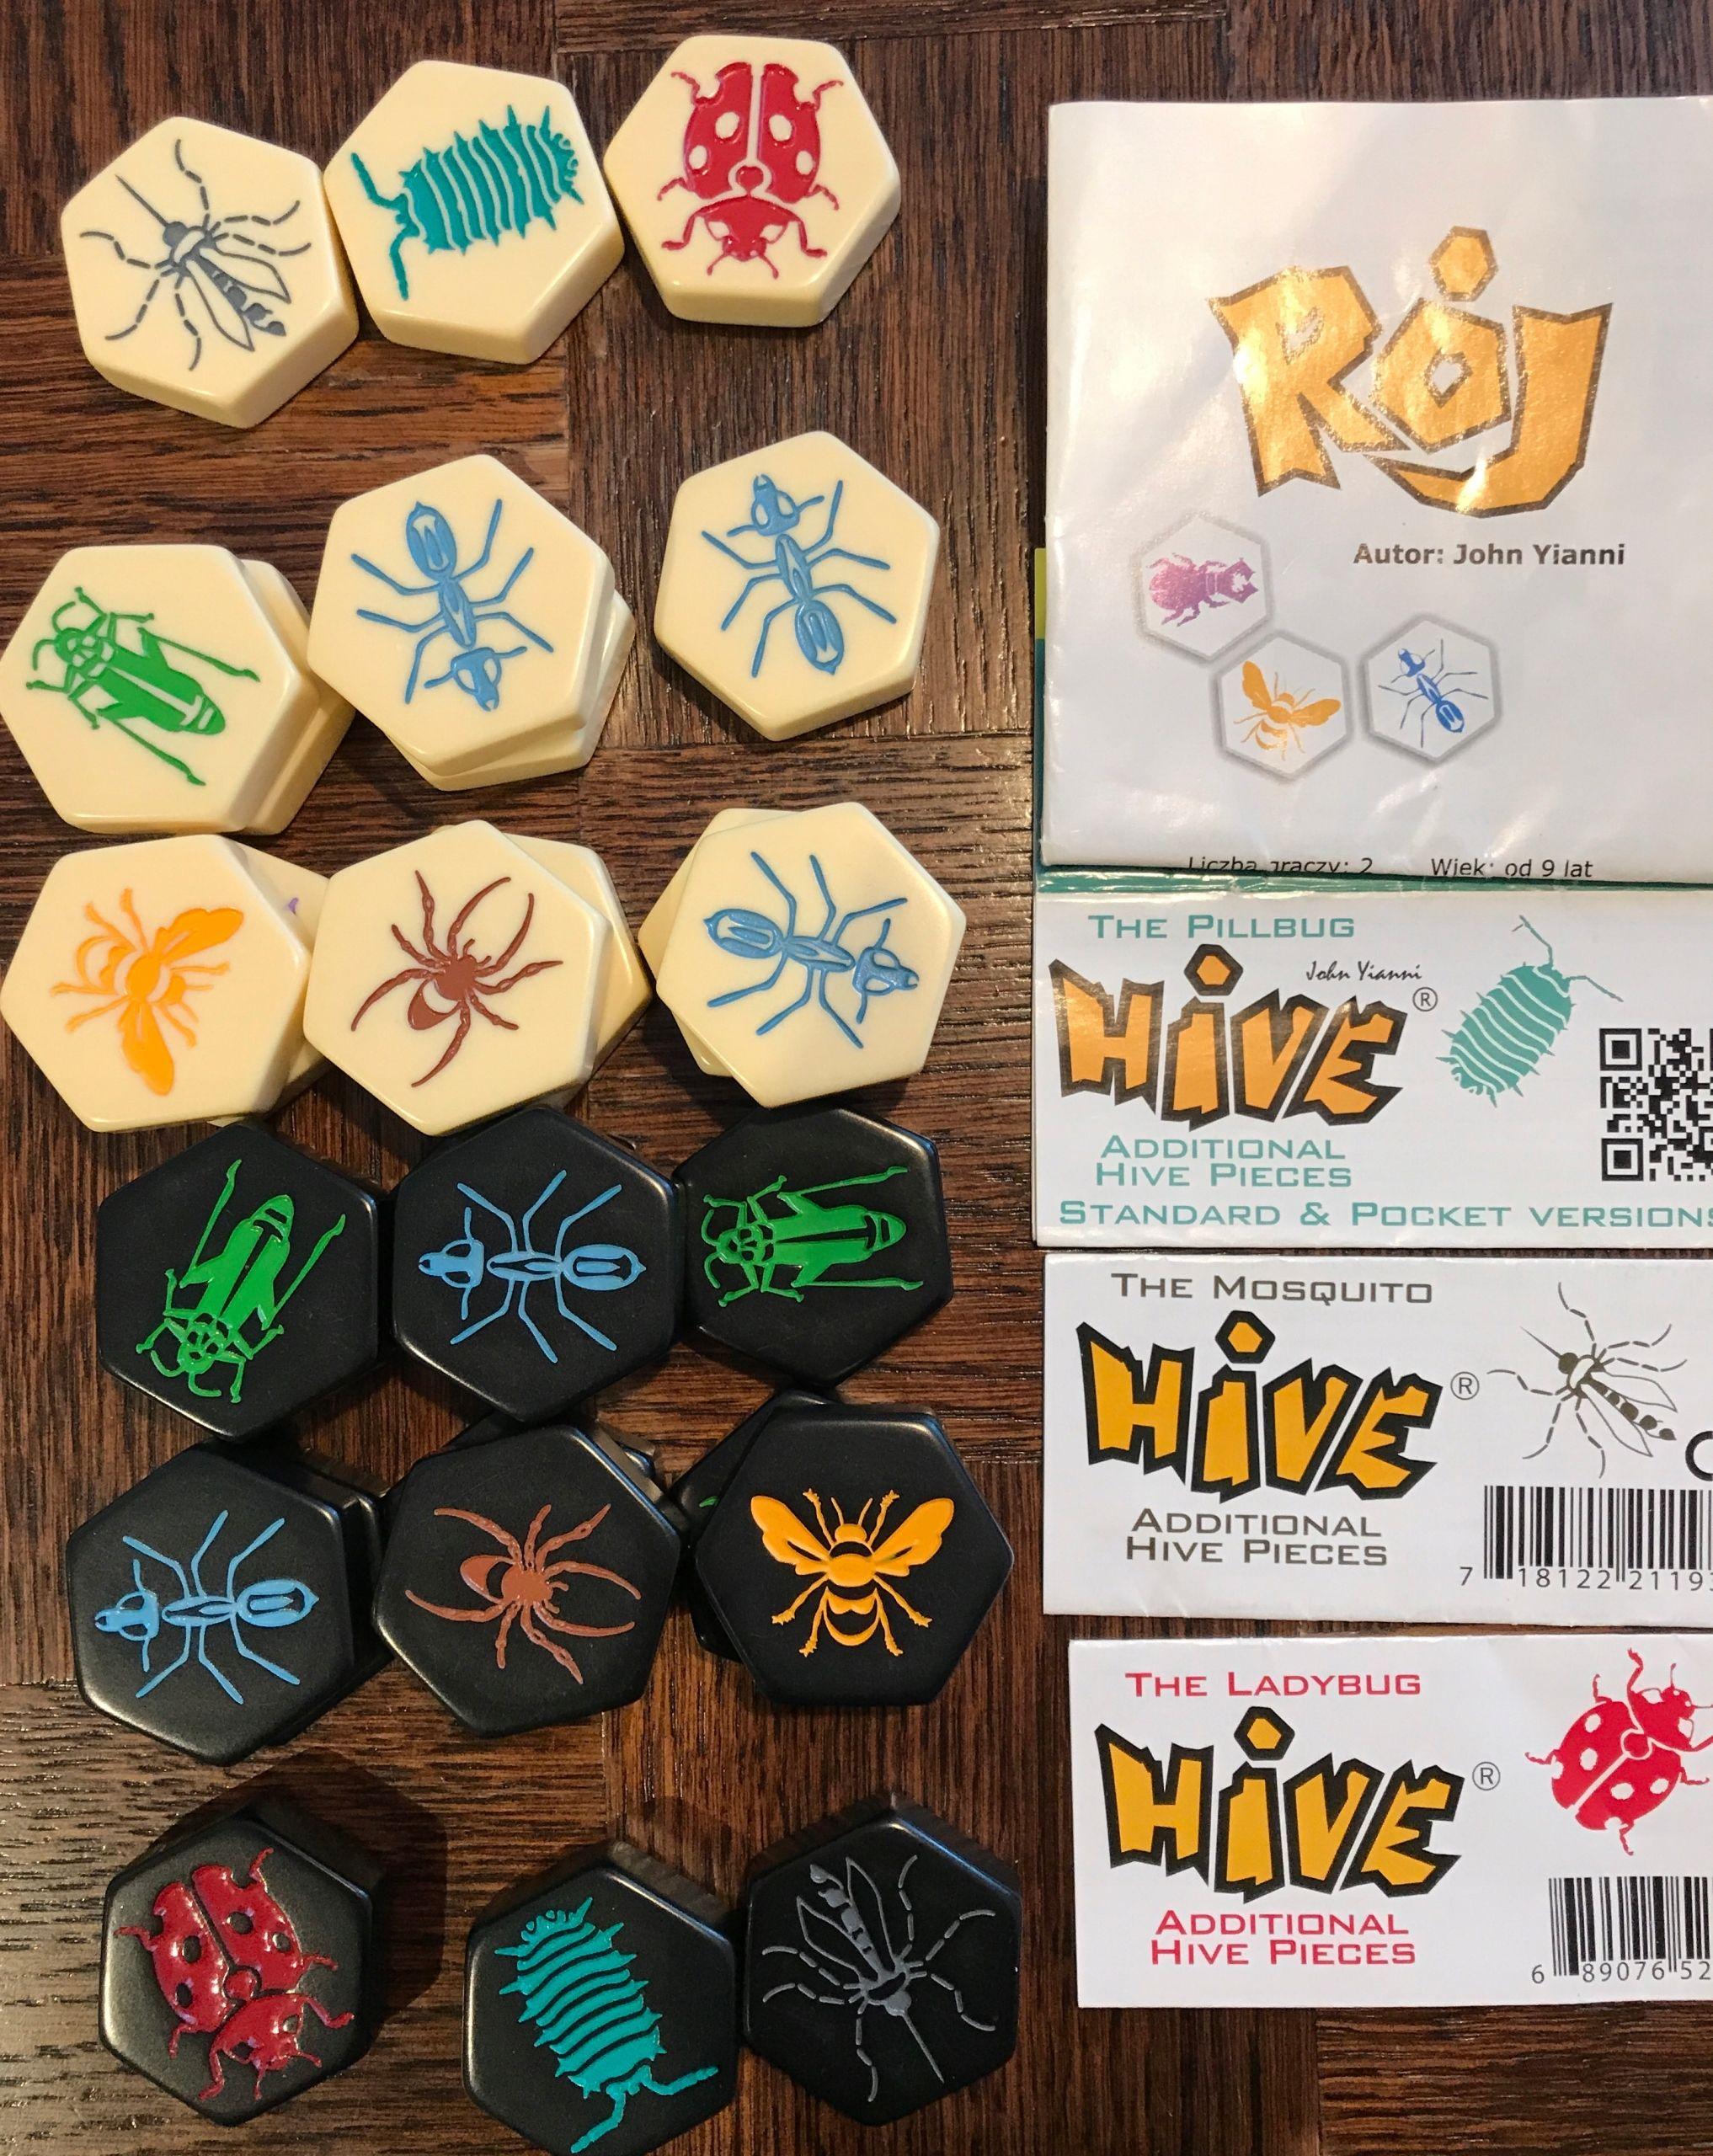 Roj Hive 3 Dodatki Gra Planszowa 7773989262 Oficjalne Archiwum Allegro Ladybug Mosquito Sugar Cookie